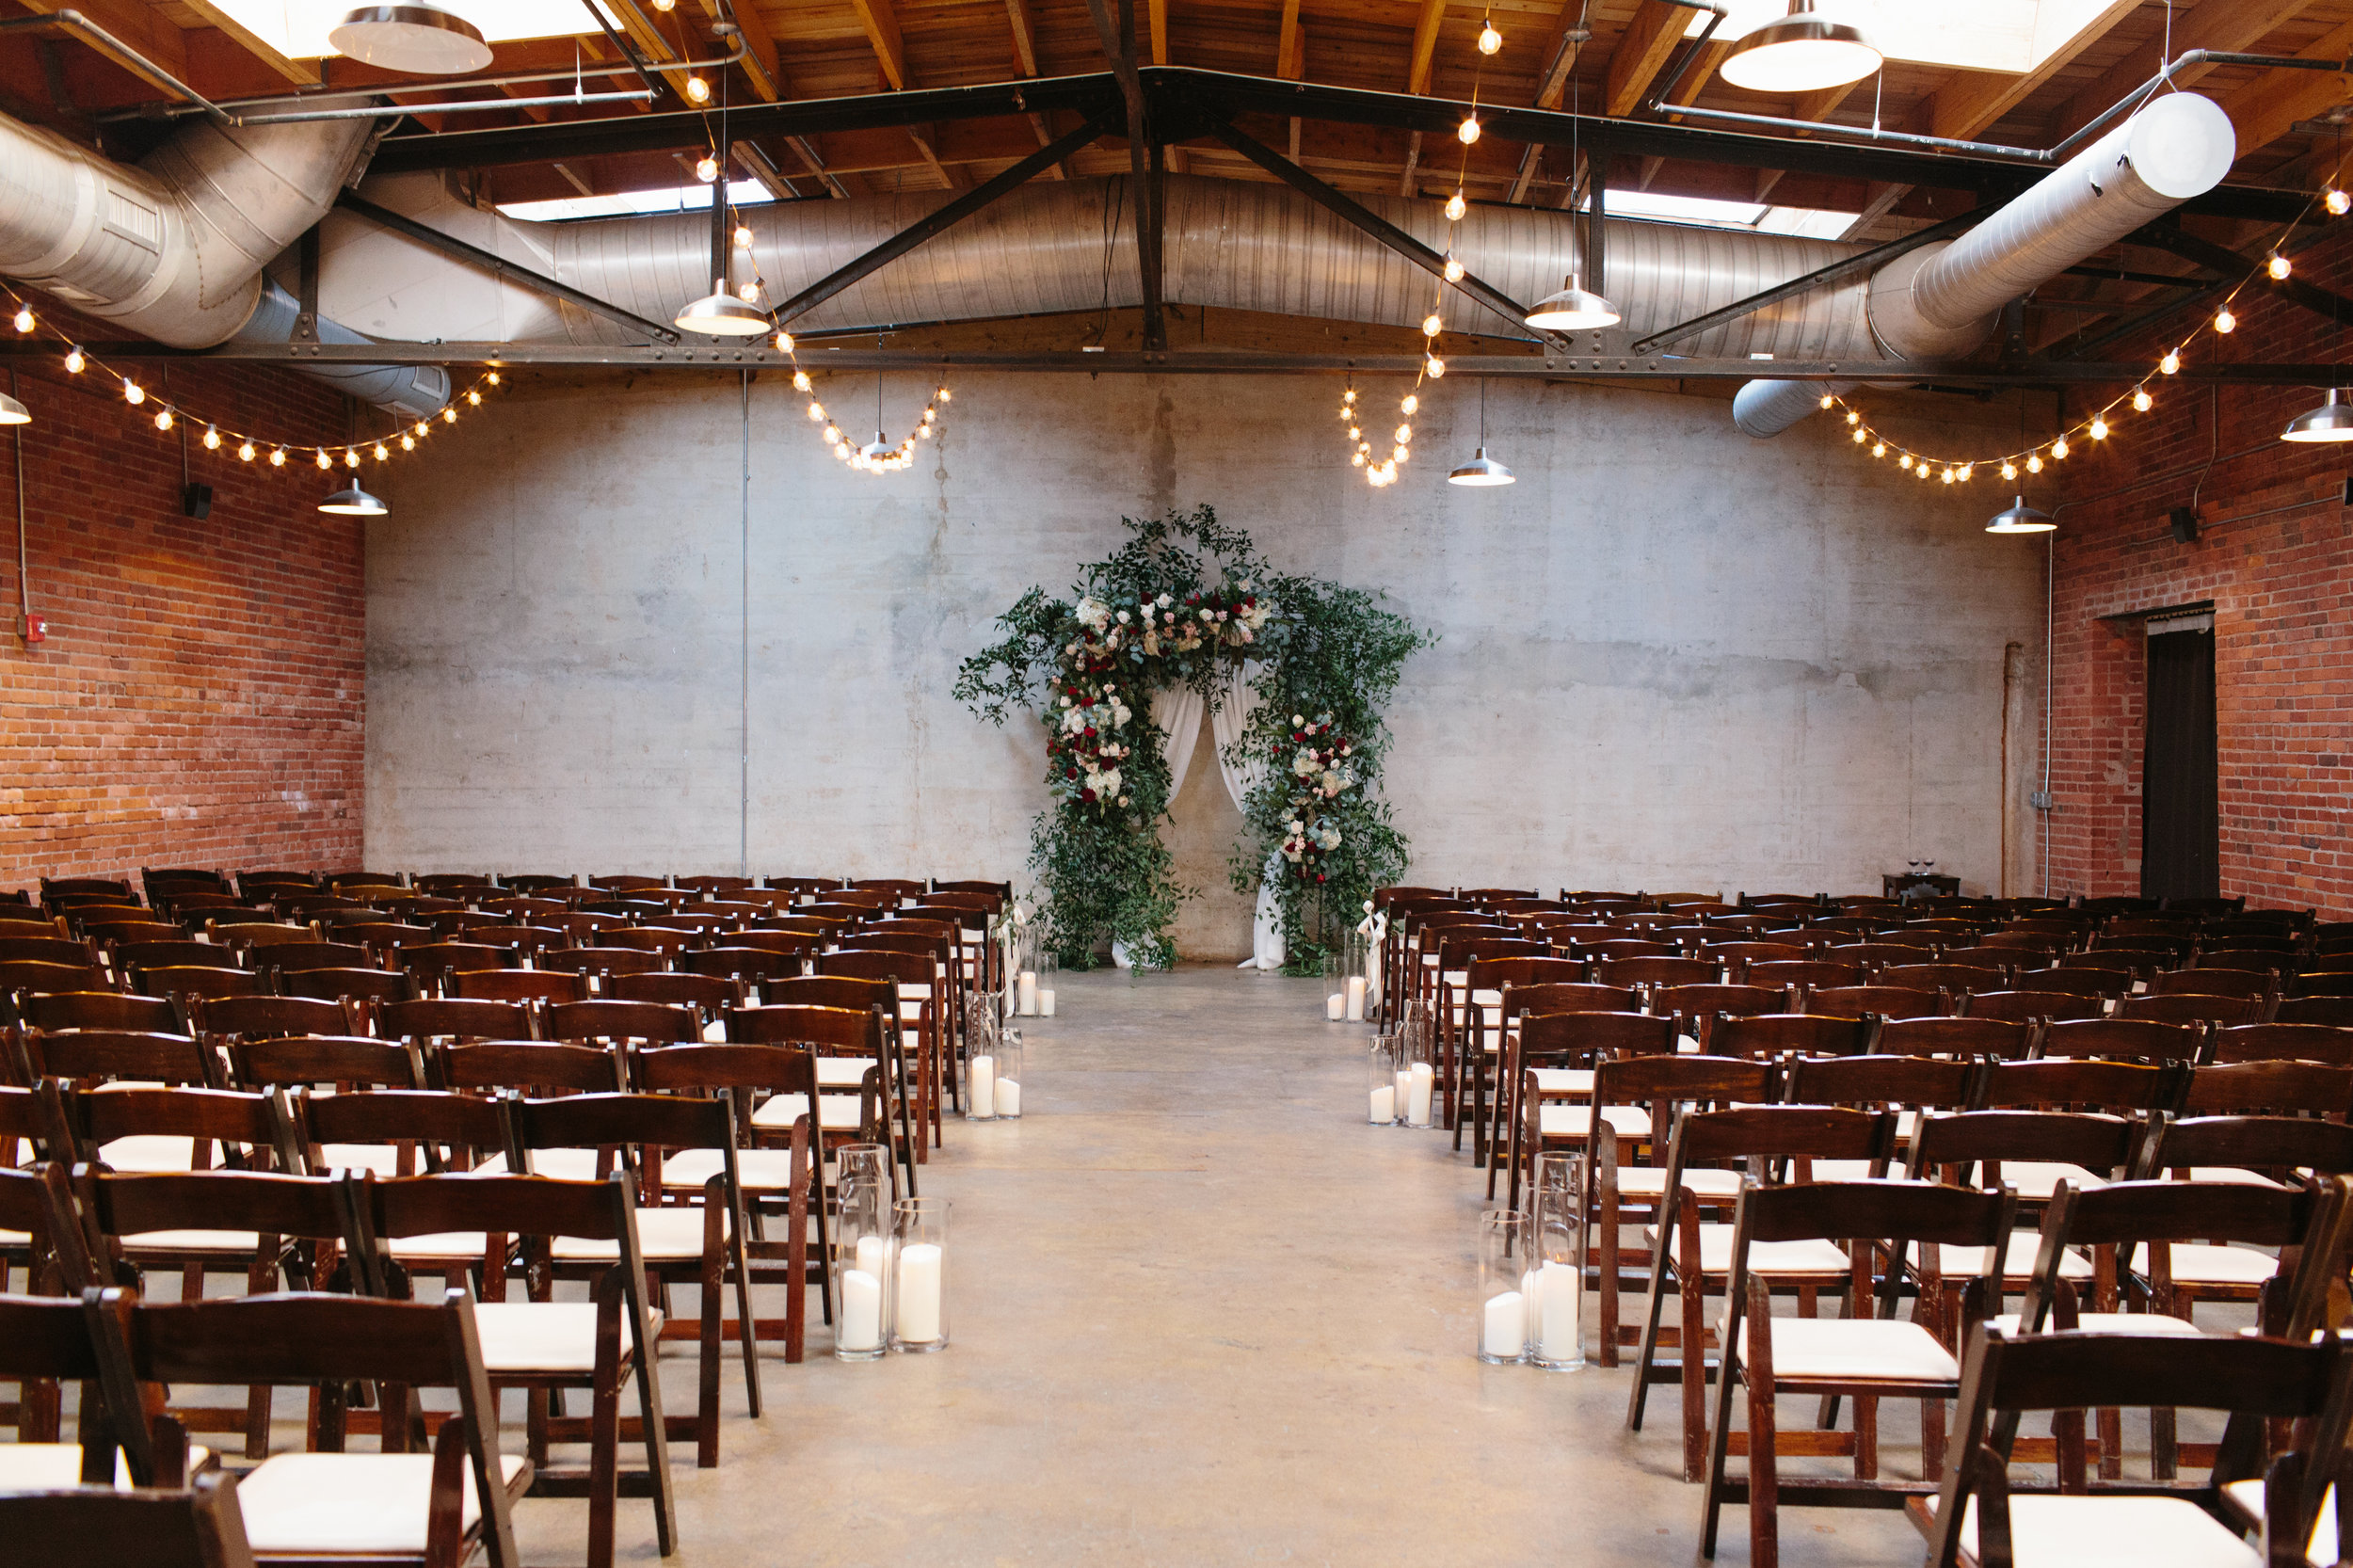 Lauren_Jeremy_Standard_Wedding_Knoxville_Abigail_Malone_Photography_FIlm-385.jpg